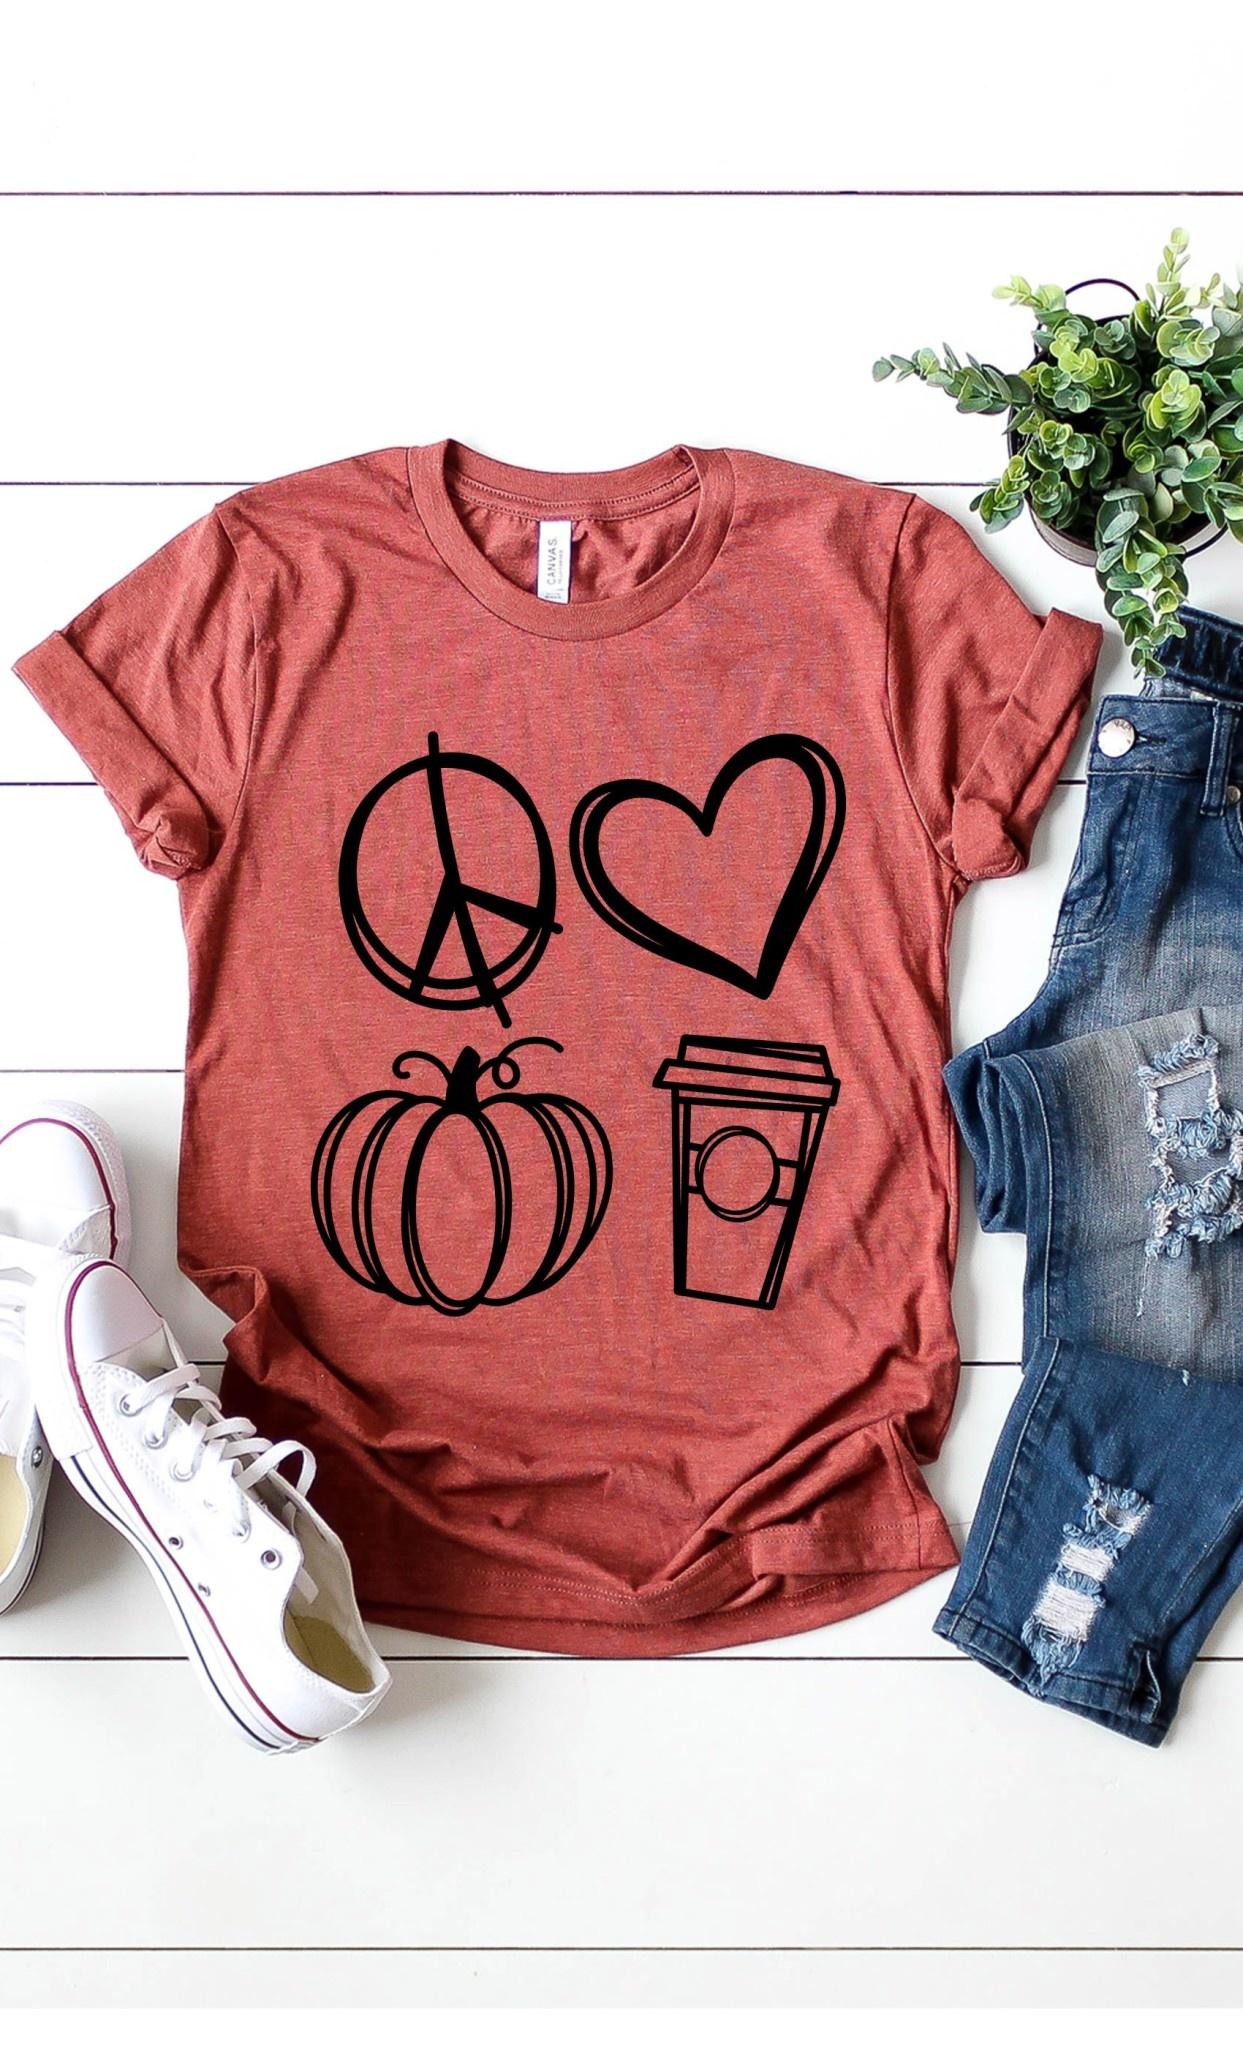 Fleurish Home Peace Love Pumpkin Spice Graphic Tee (Heather Clay)*